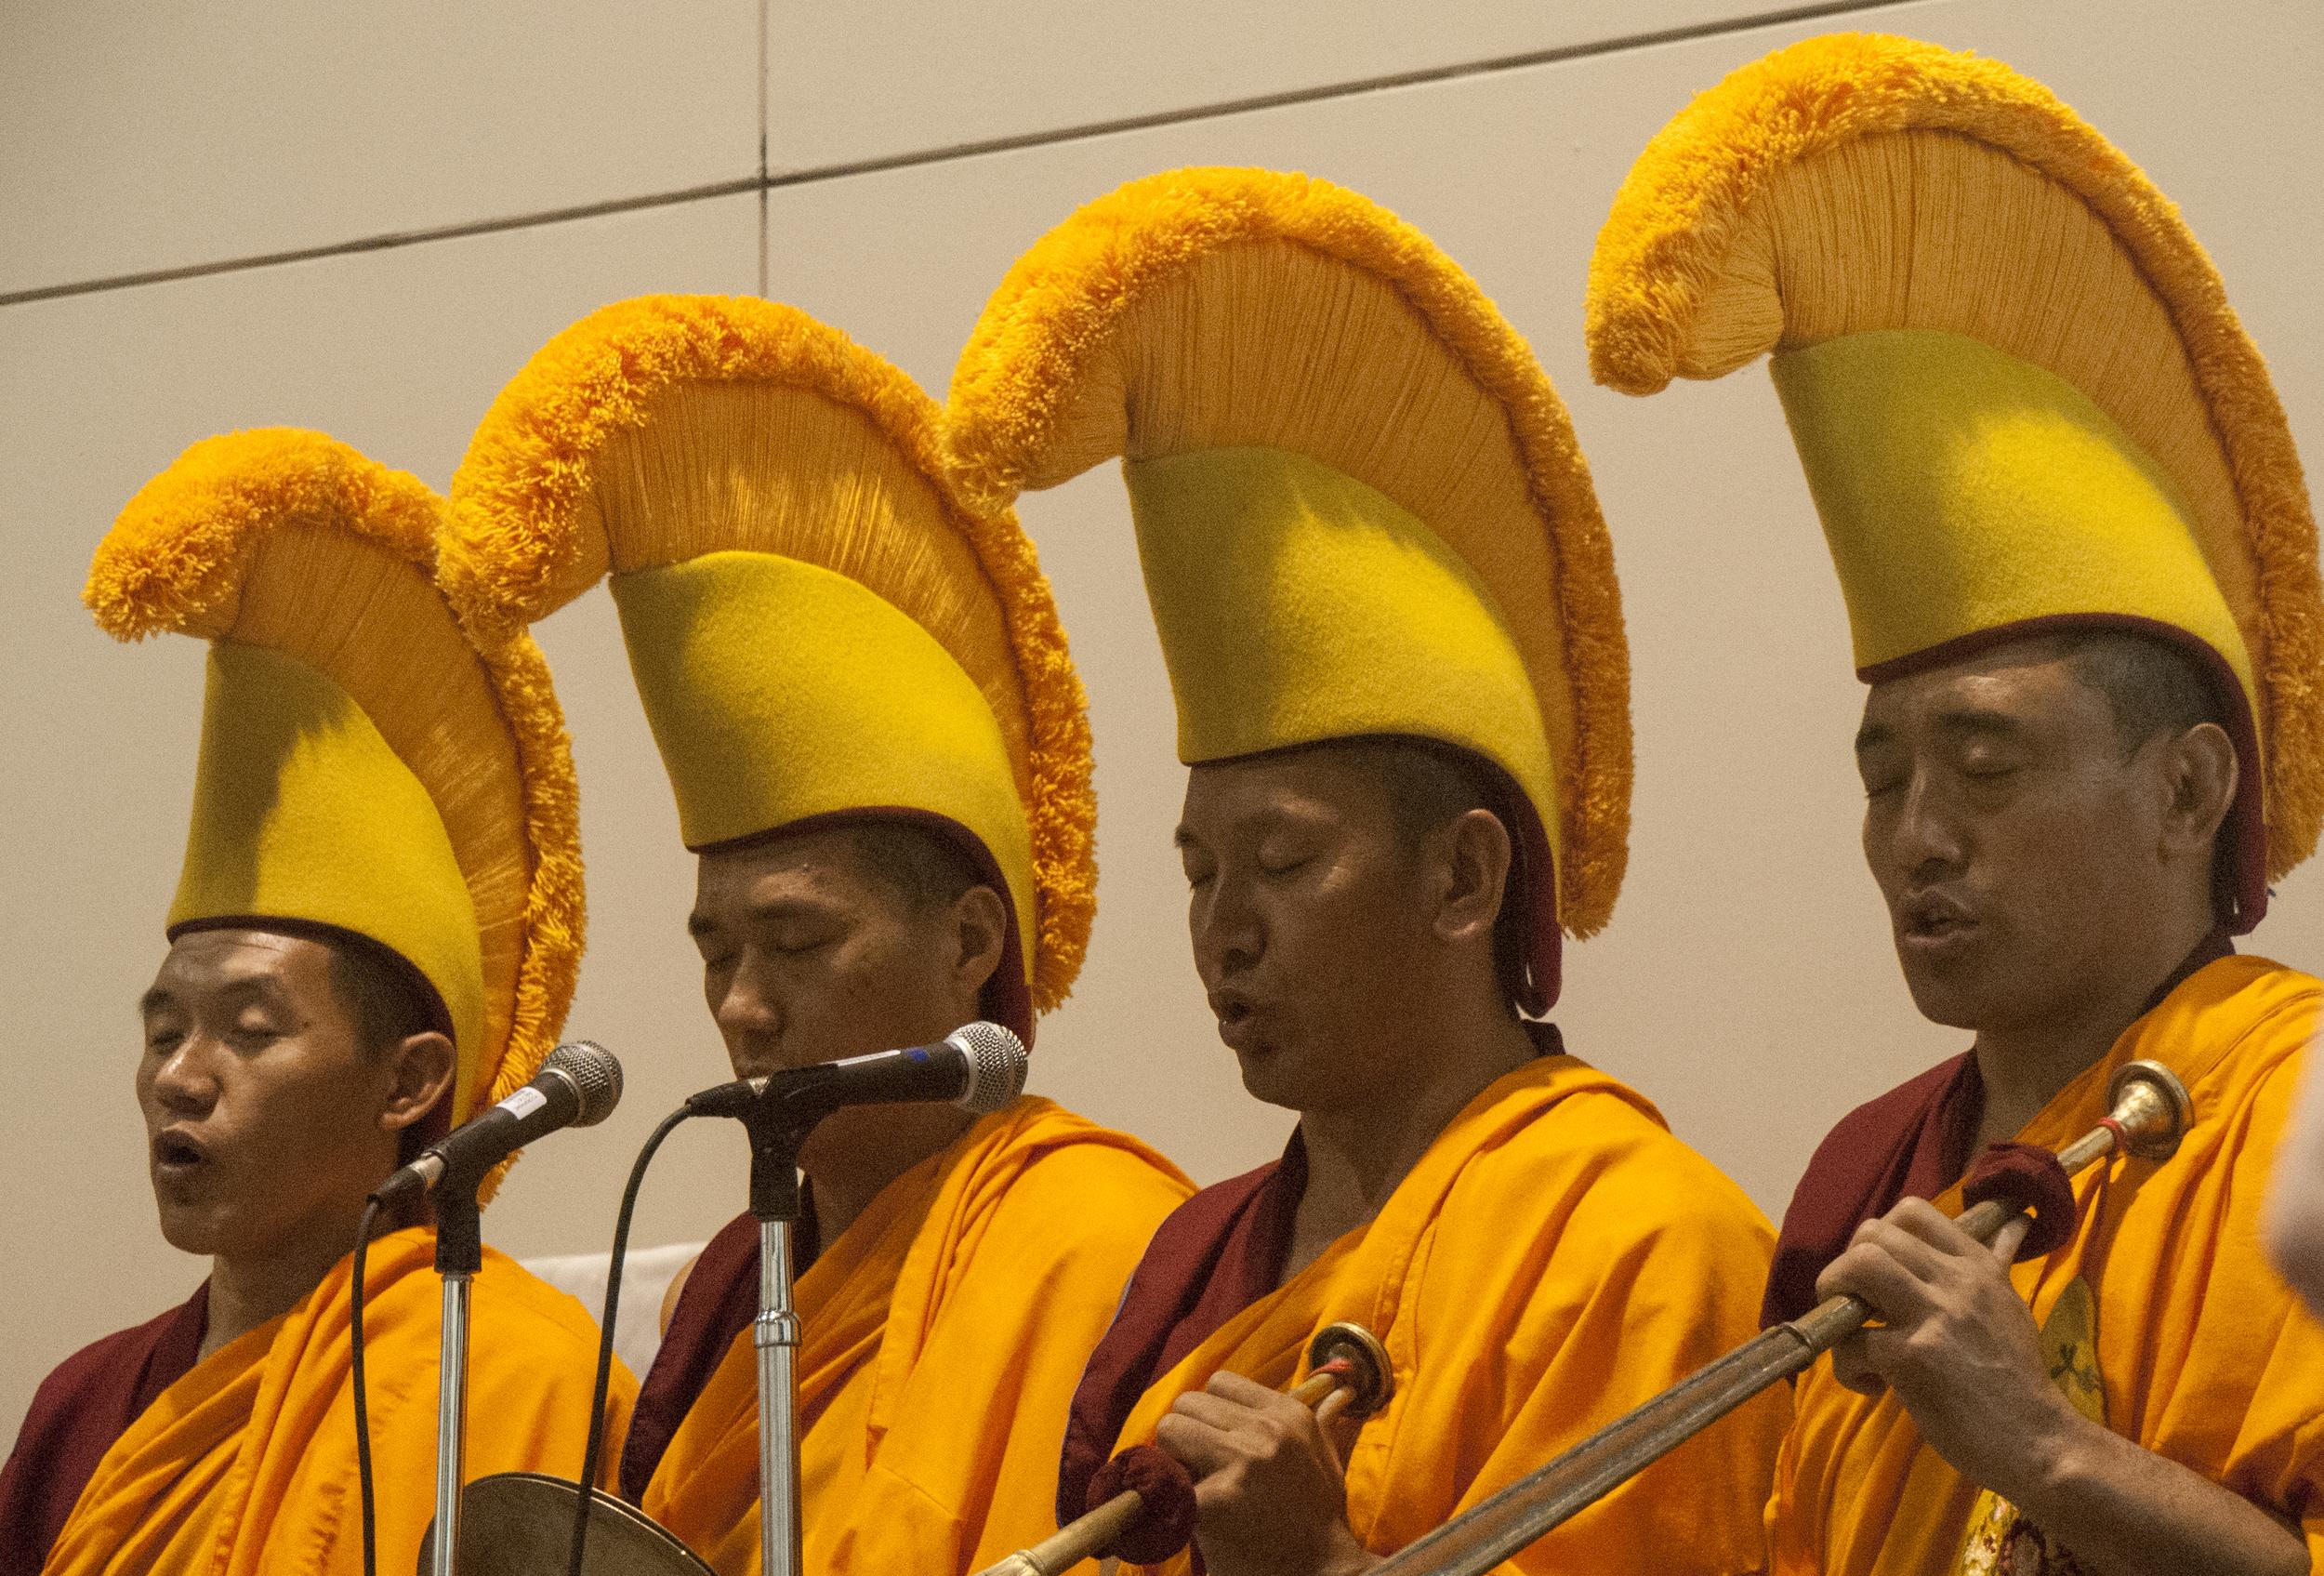 Tibetan Buddhist monks performing the ceremonial deconstruction chant